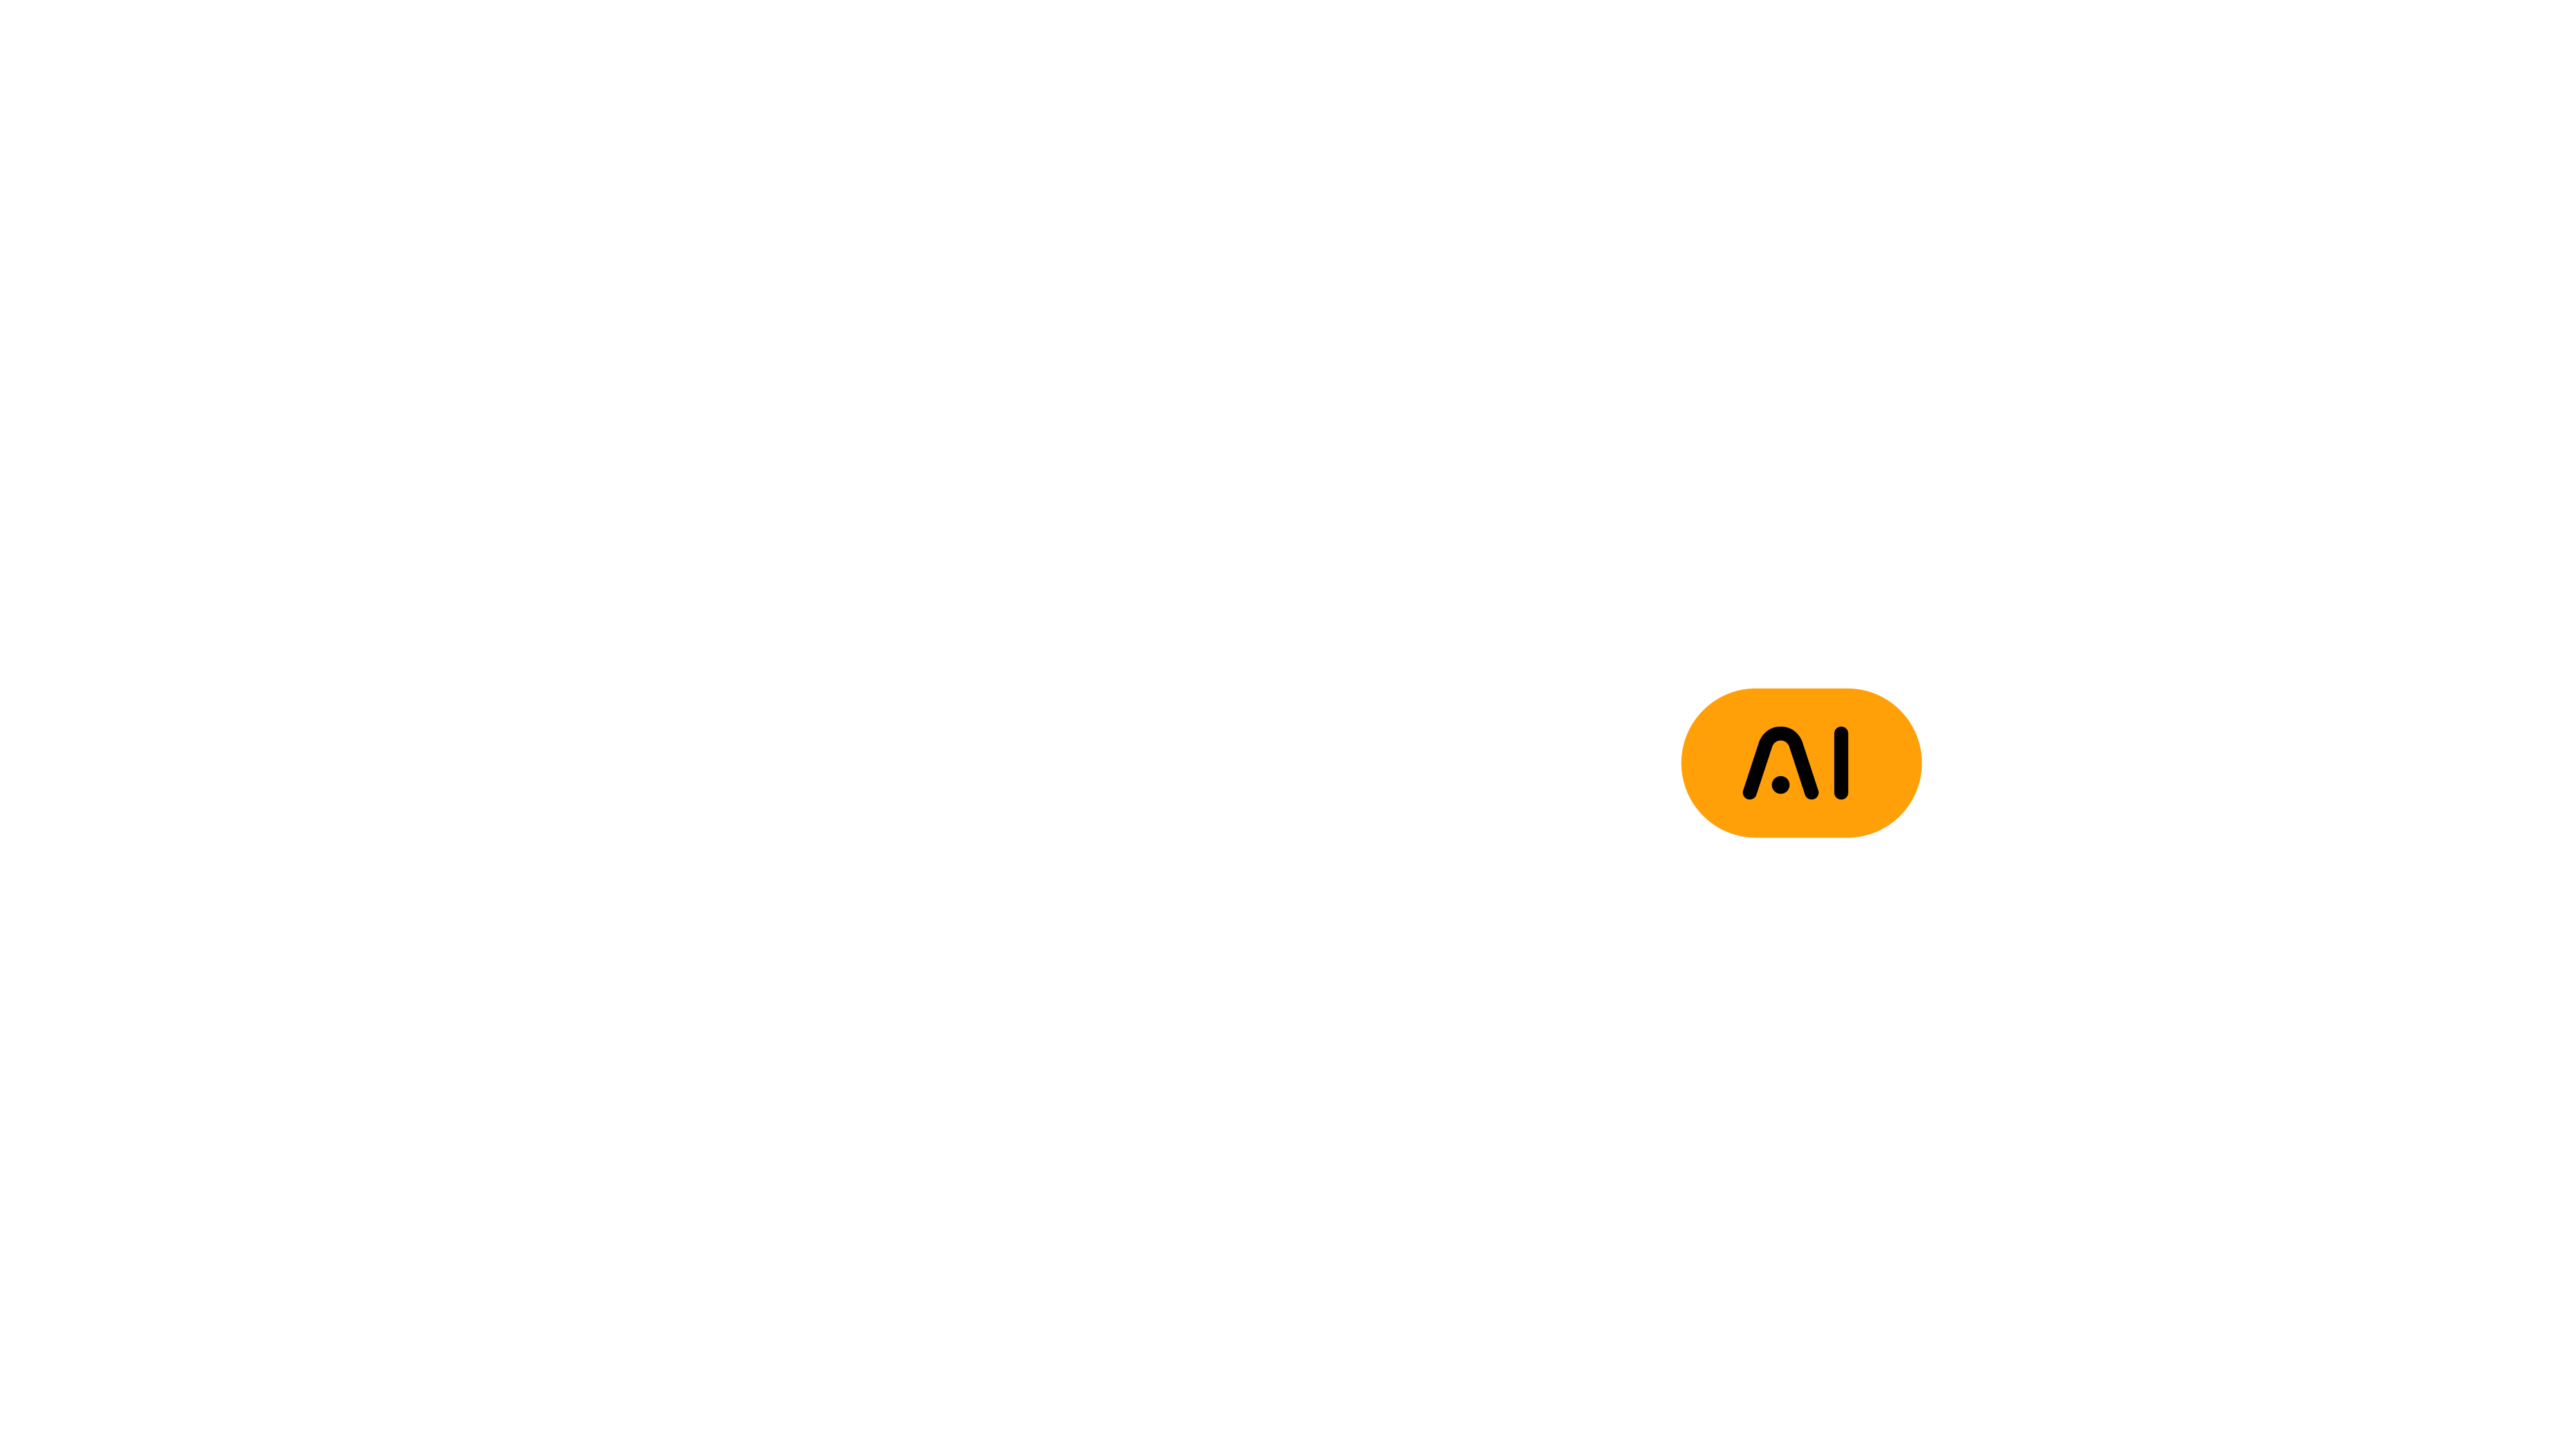 Slimmer AI